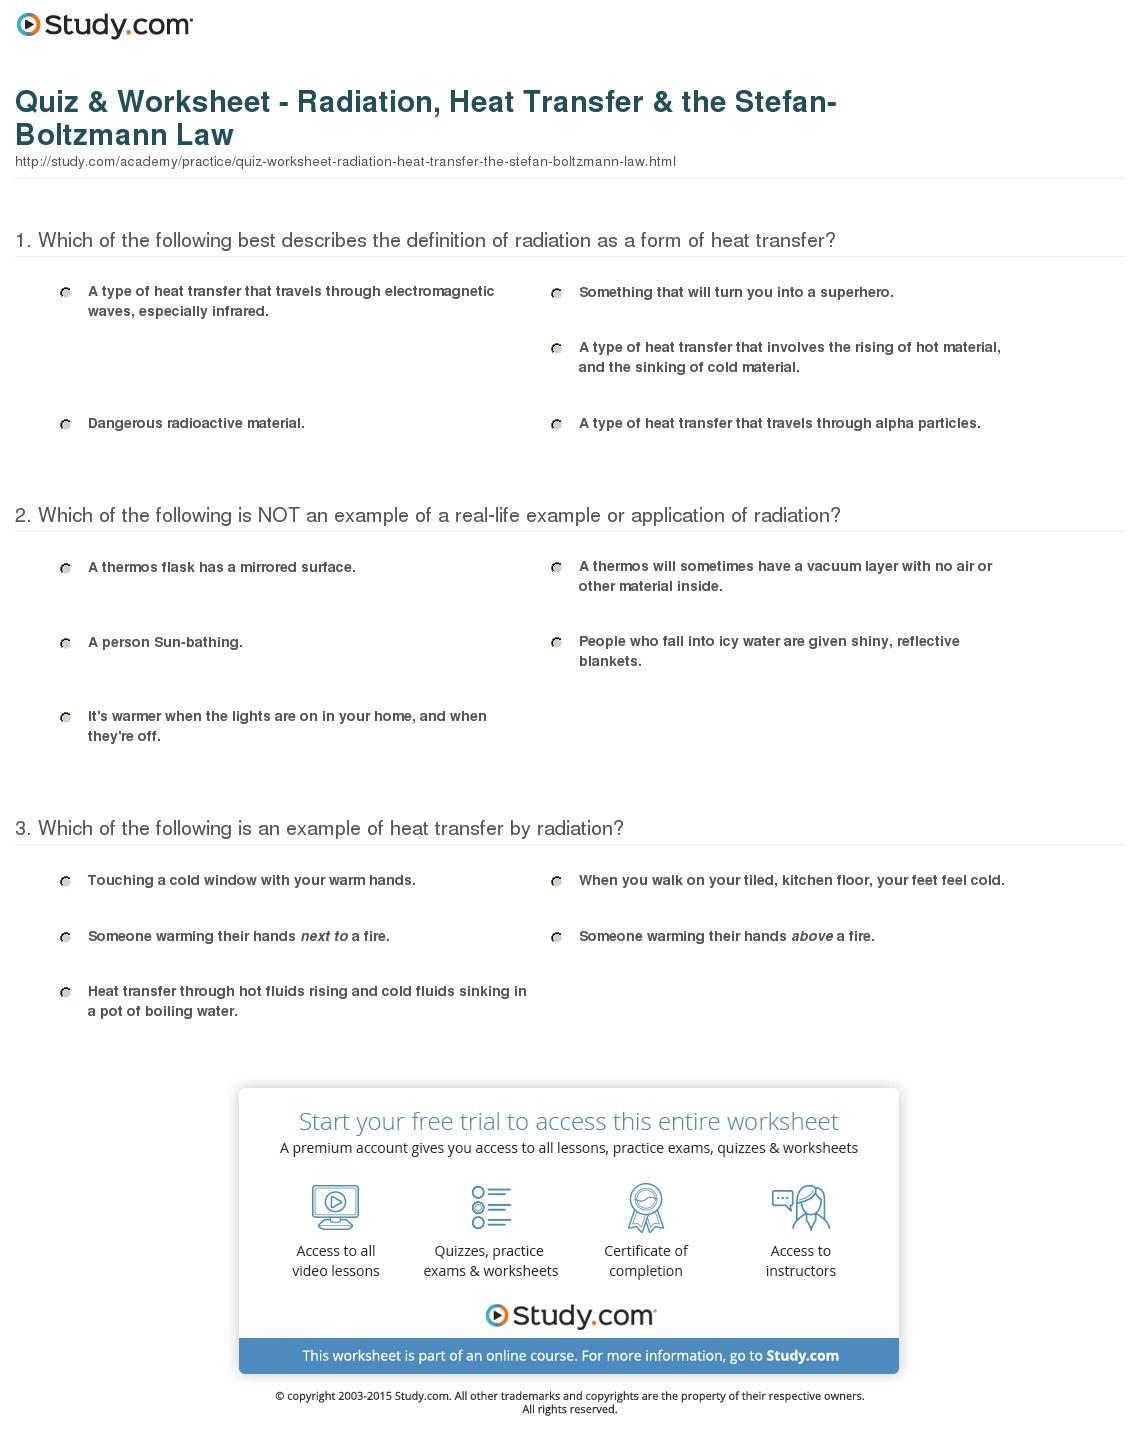 Oil Or Gas Heating Science Worksheet 2 10a Heat Transfer